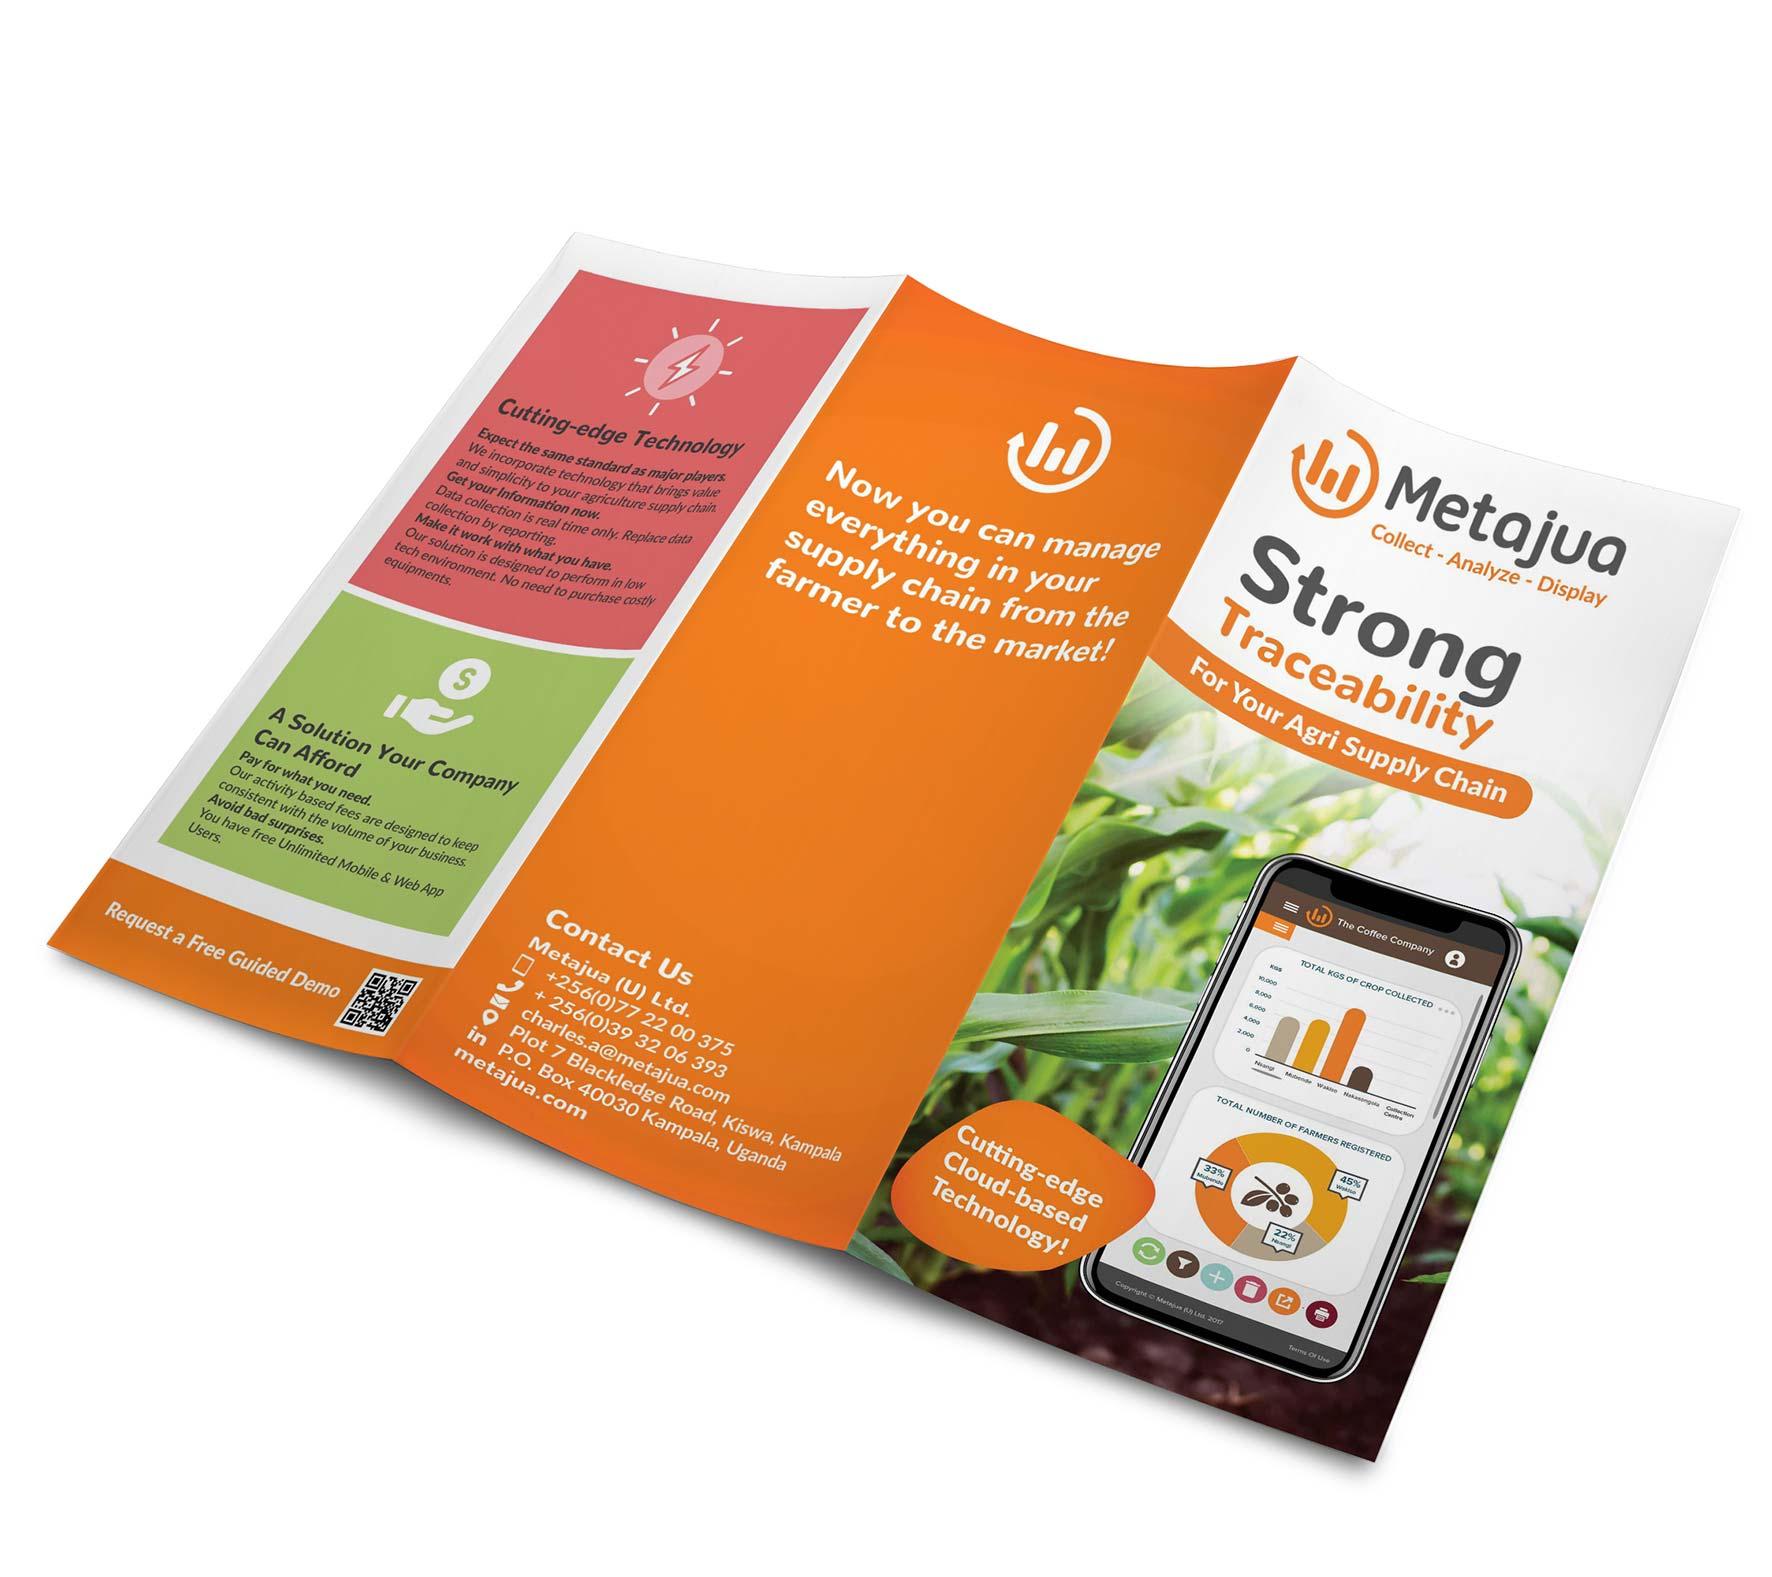 Brochure marketing material design